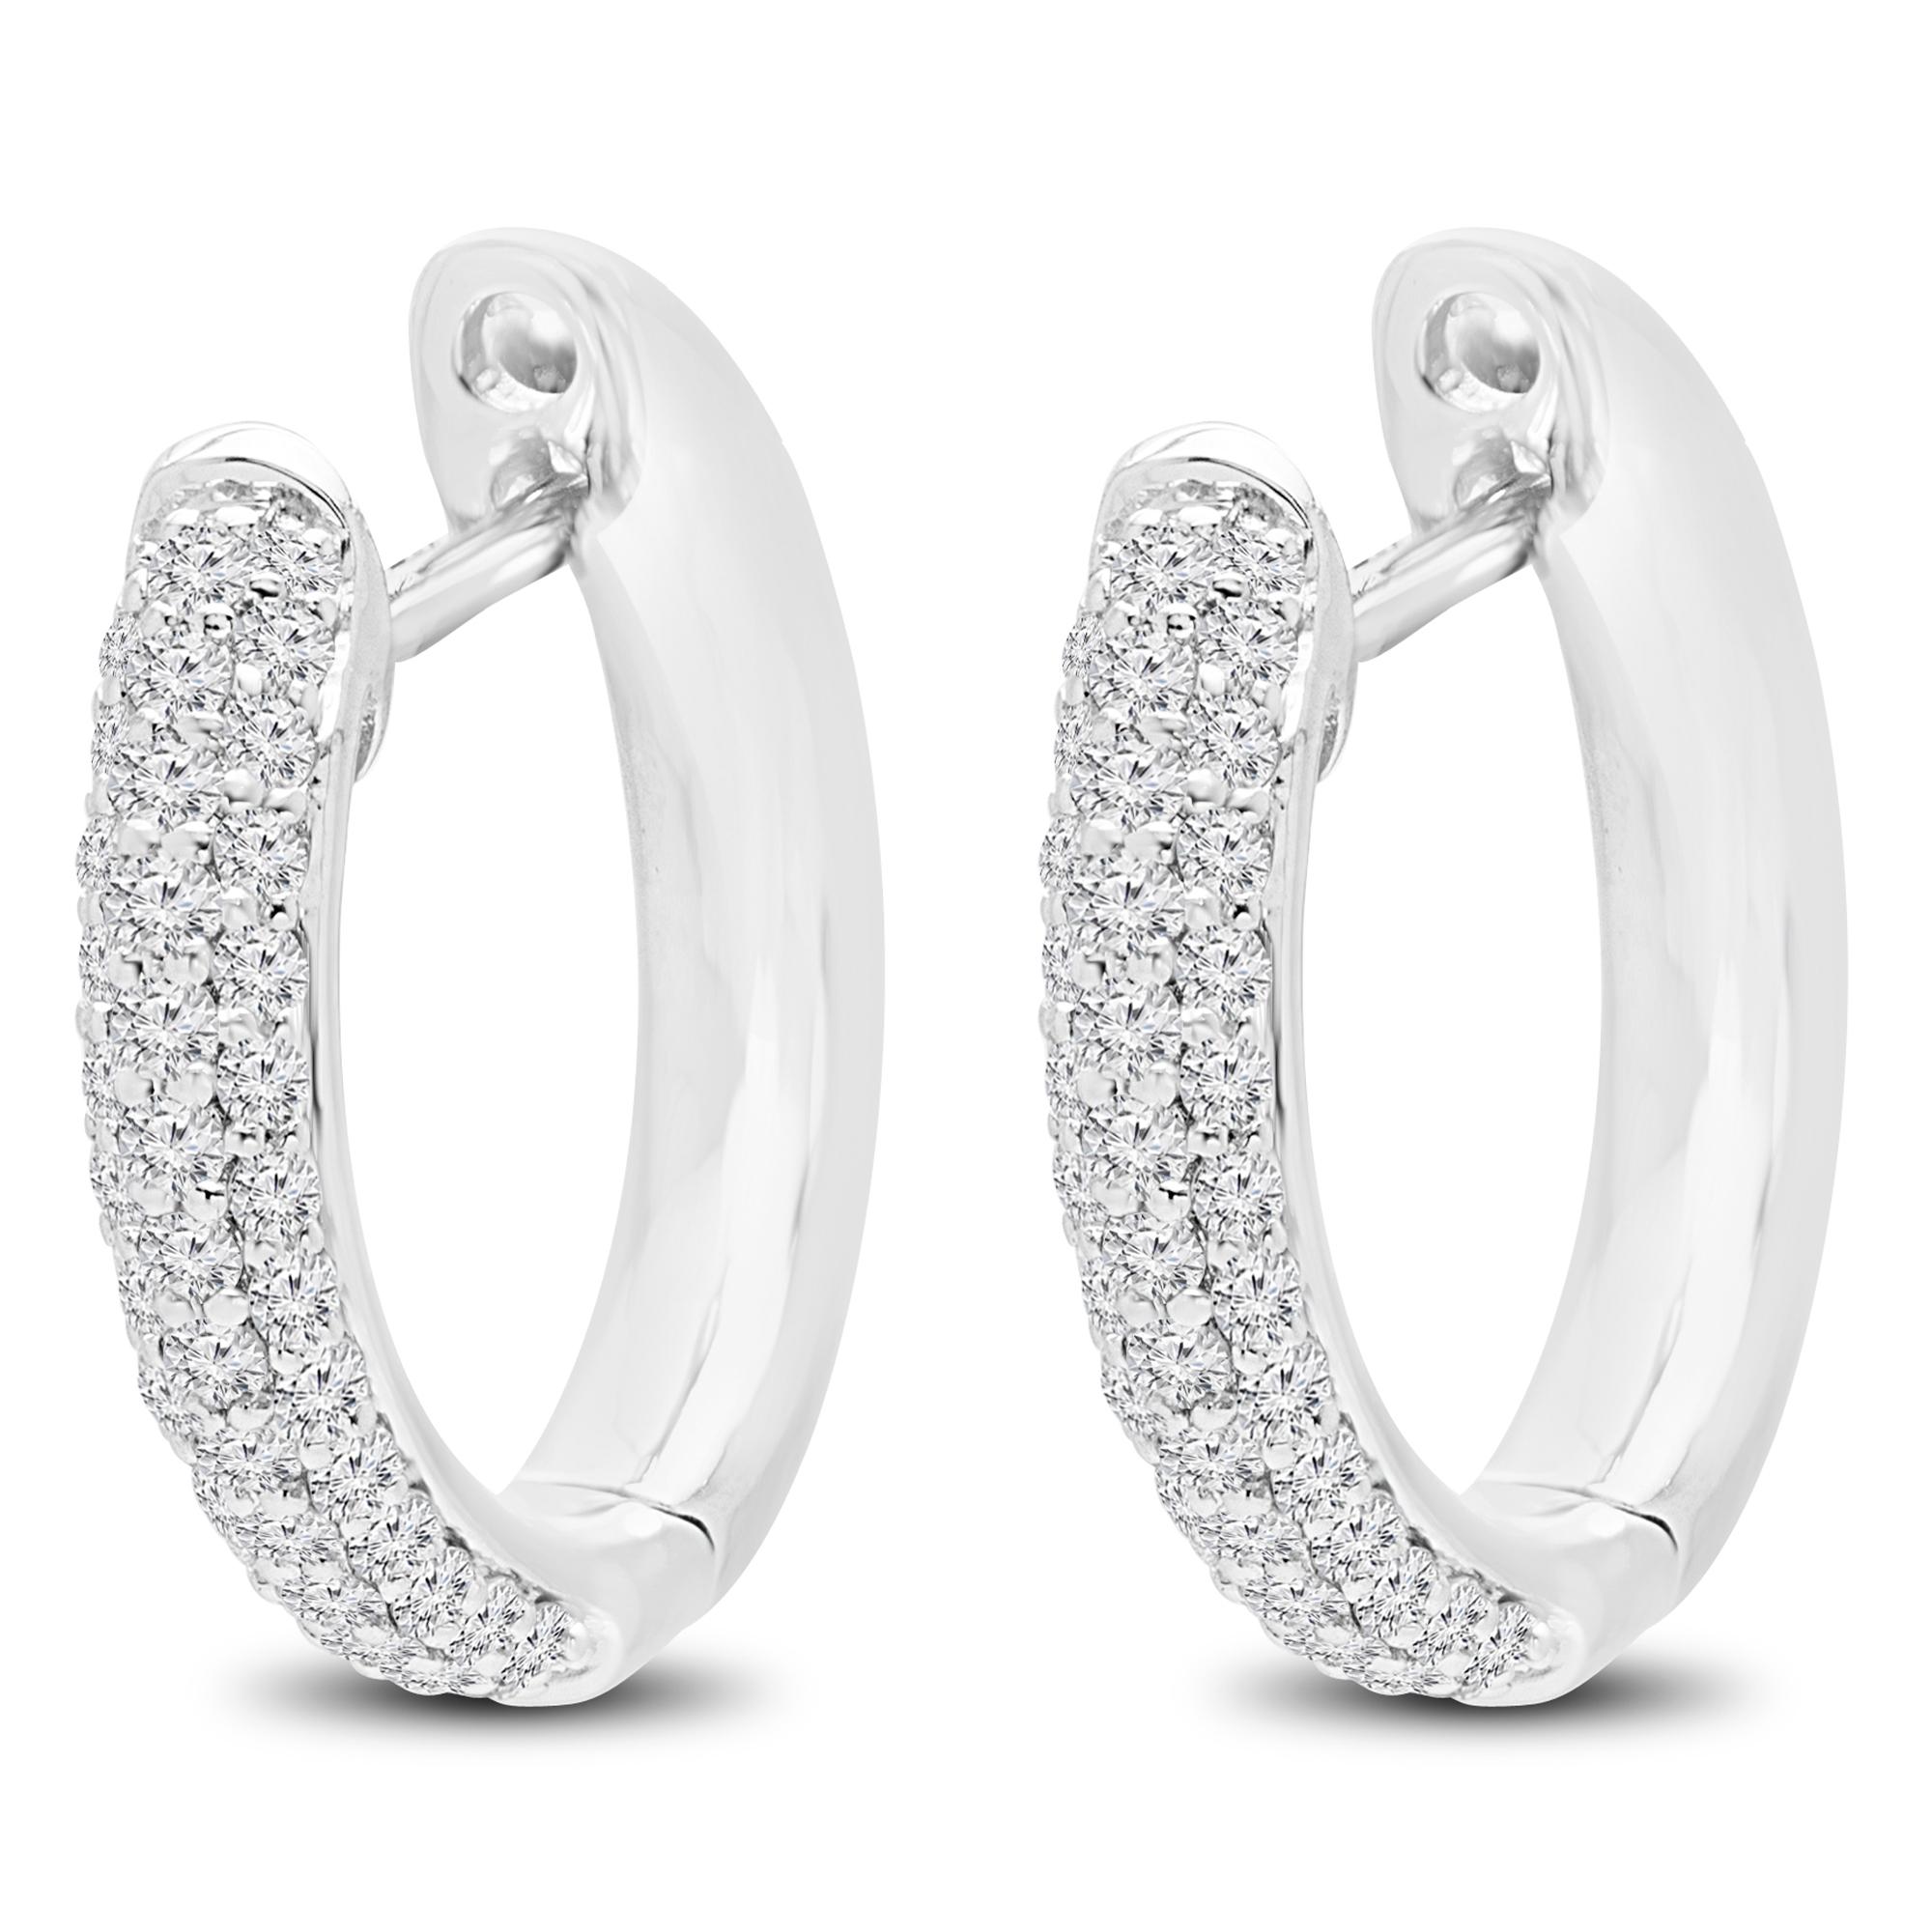 1/2 CTW Round Diamond Hoop Earrings in 14K White Gold (MDR170116) - image 2 de 2